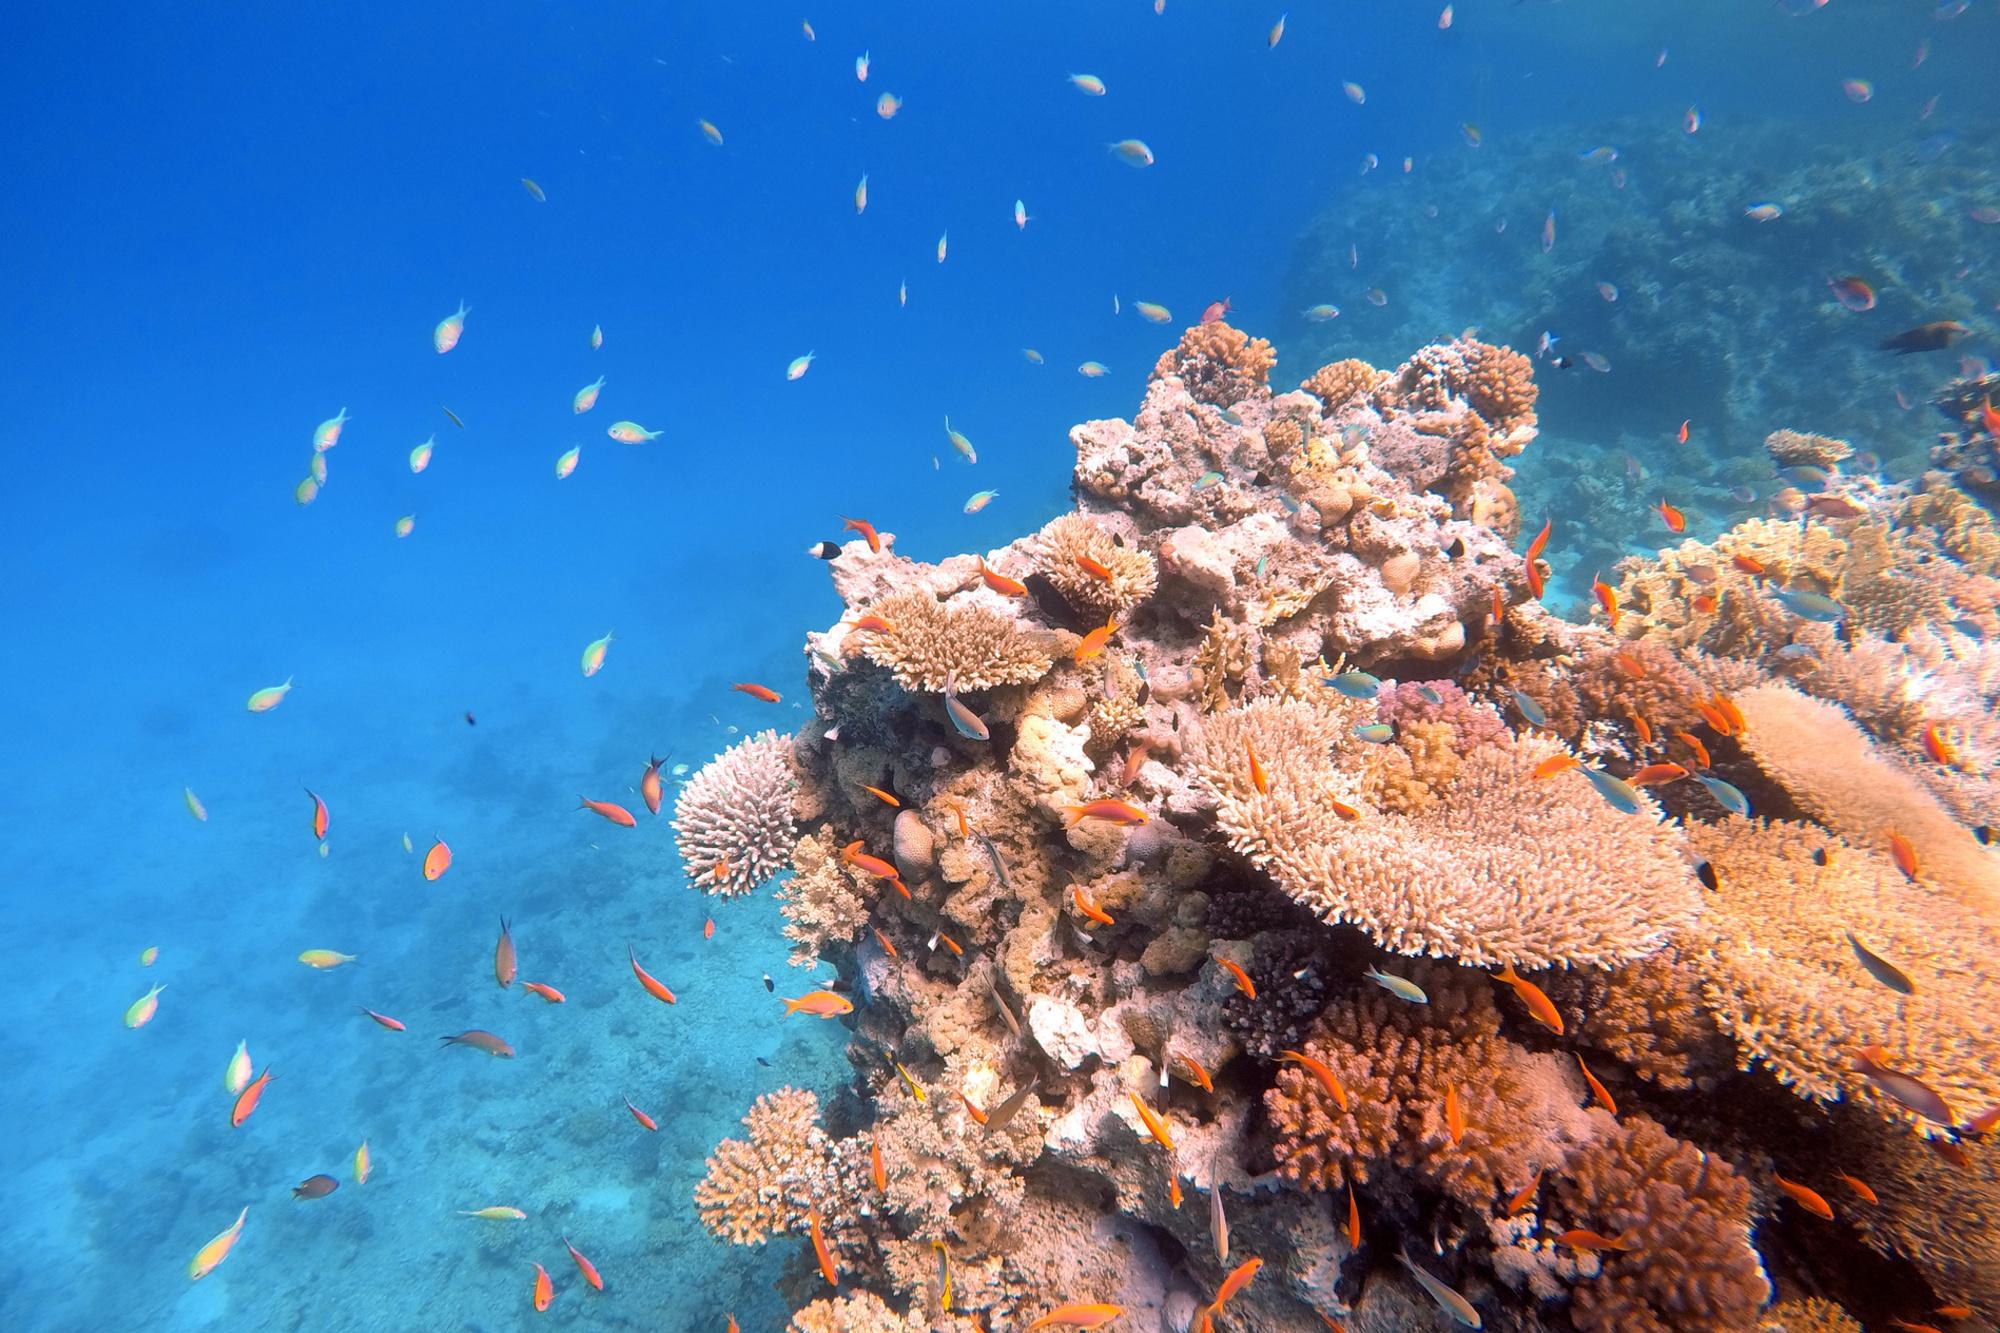 Under the sea, iStock